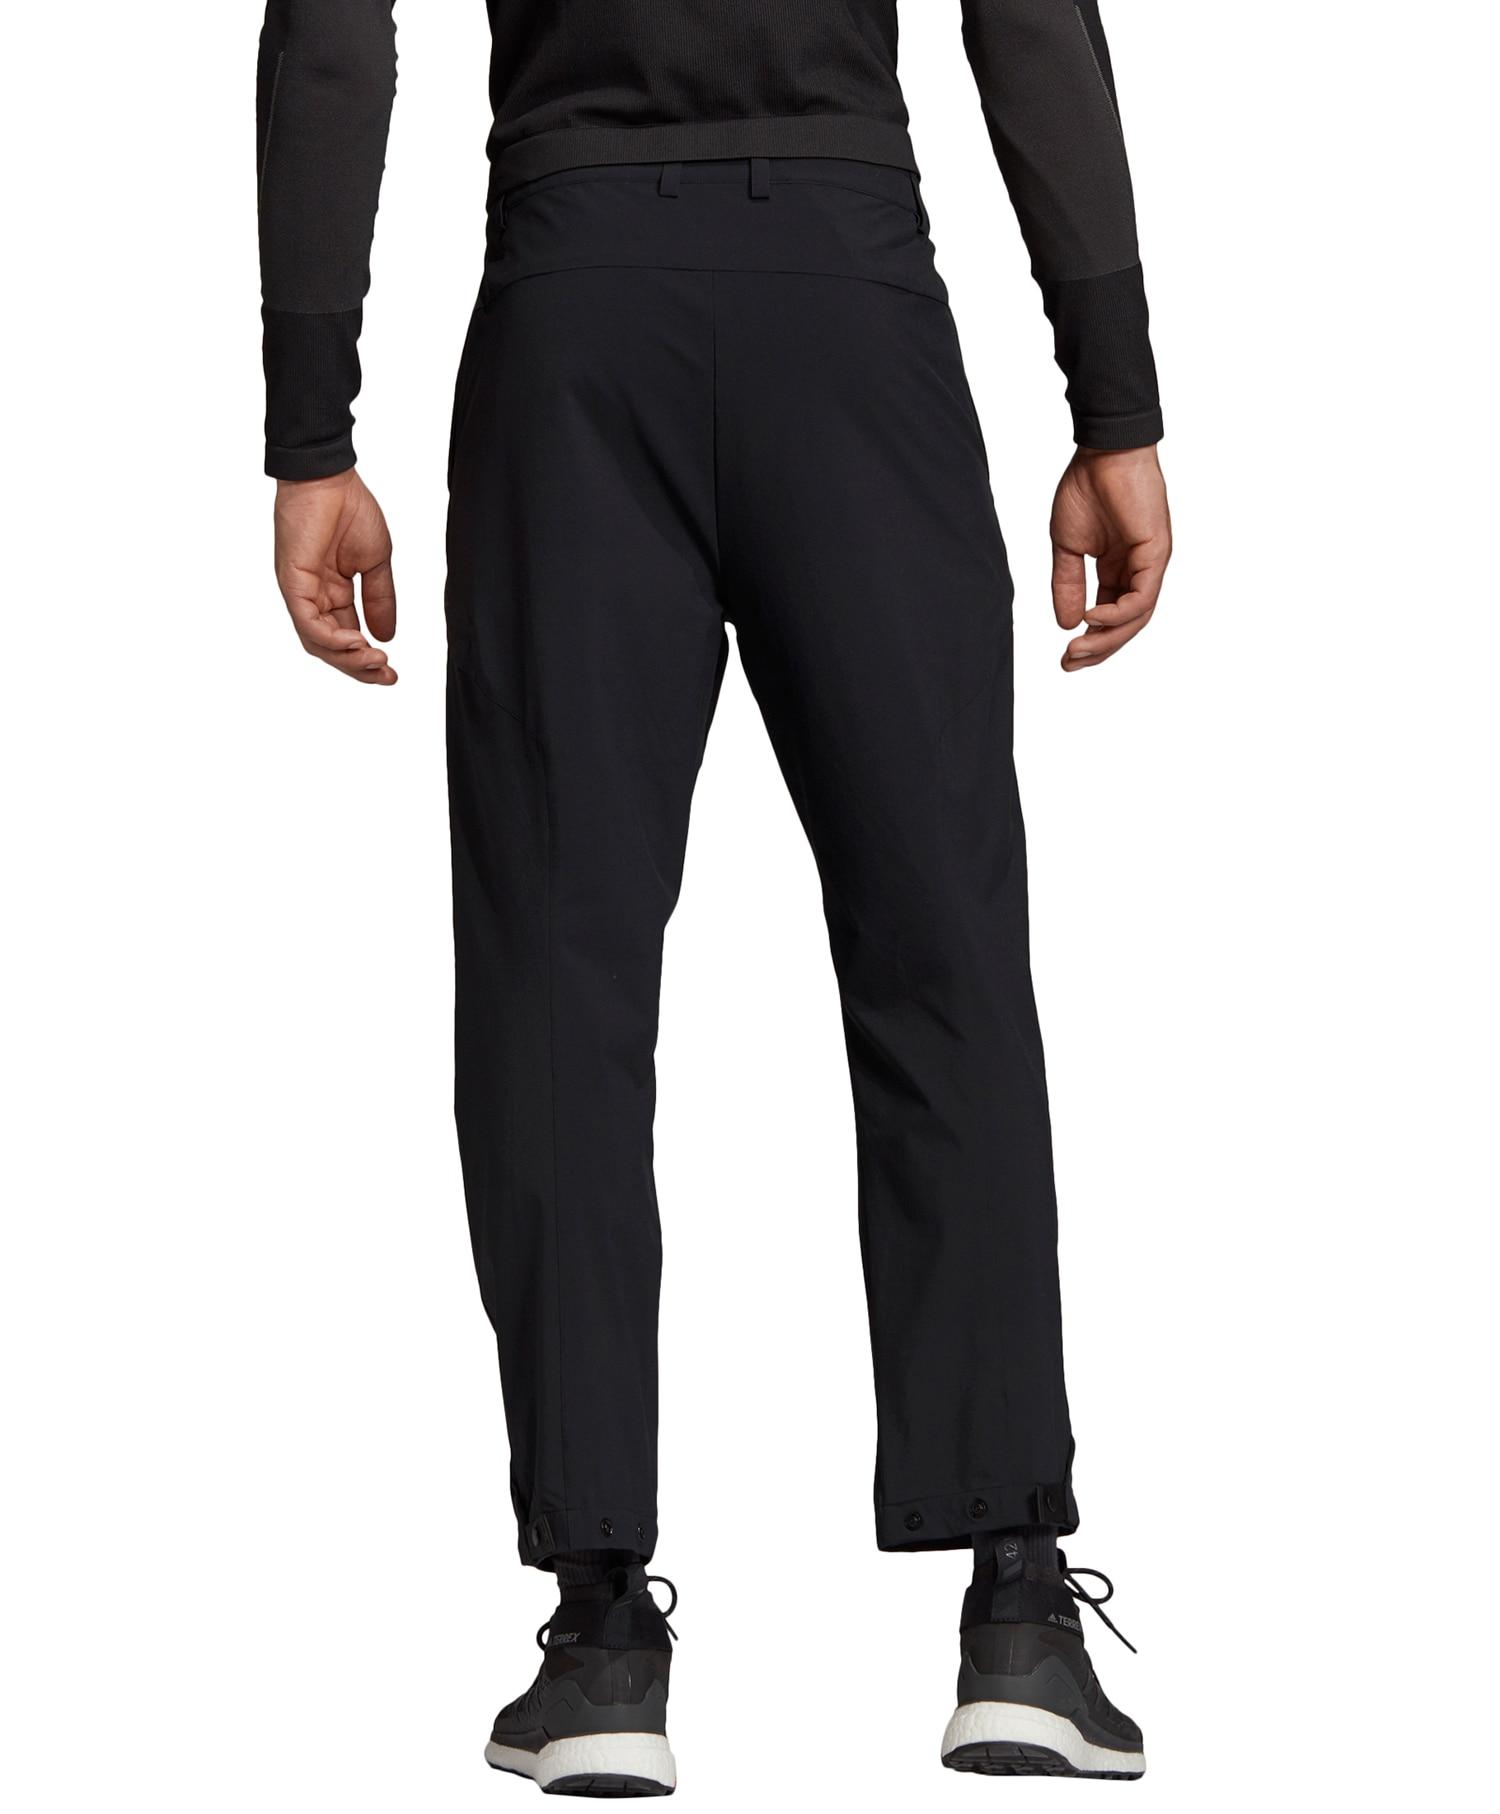 Adidas Hike Pants